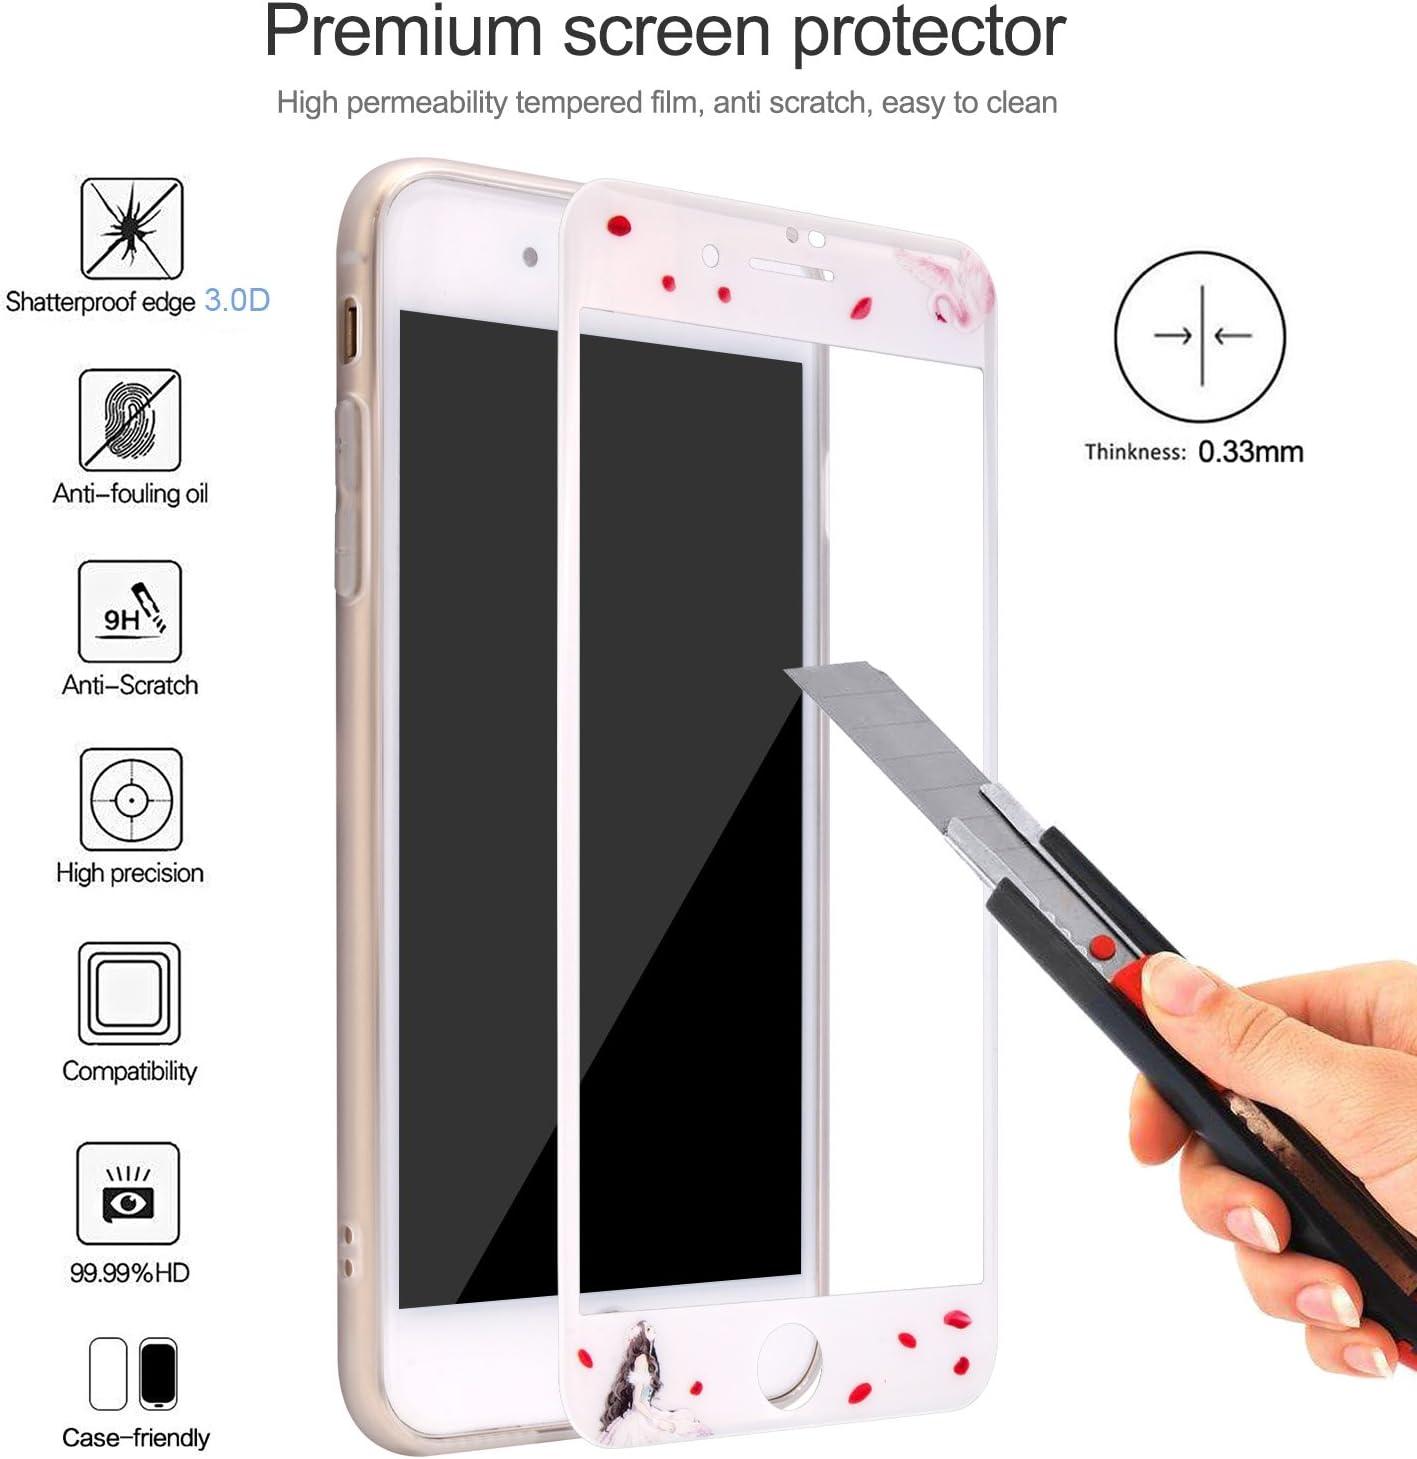 1 St/ück FCLTech Displayschutzfolie f/ür iPhone 6 Plus//iPhone 6S Plus HD Klar 9H H/ärtegrad Geh/ärtetes Glas Panzerglasfolie Displayschutzfolie kompatibel mit Apple iPhone 6 Plus//iPhone 6S Plus